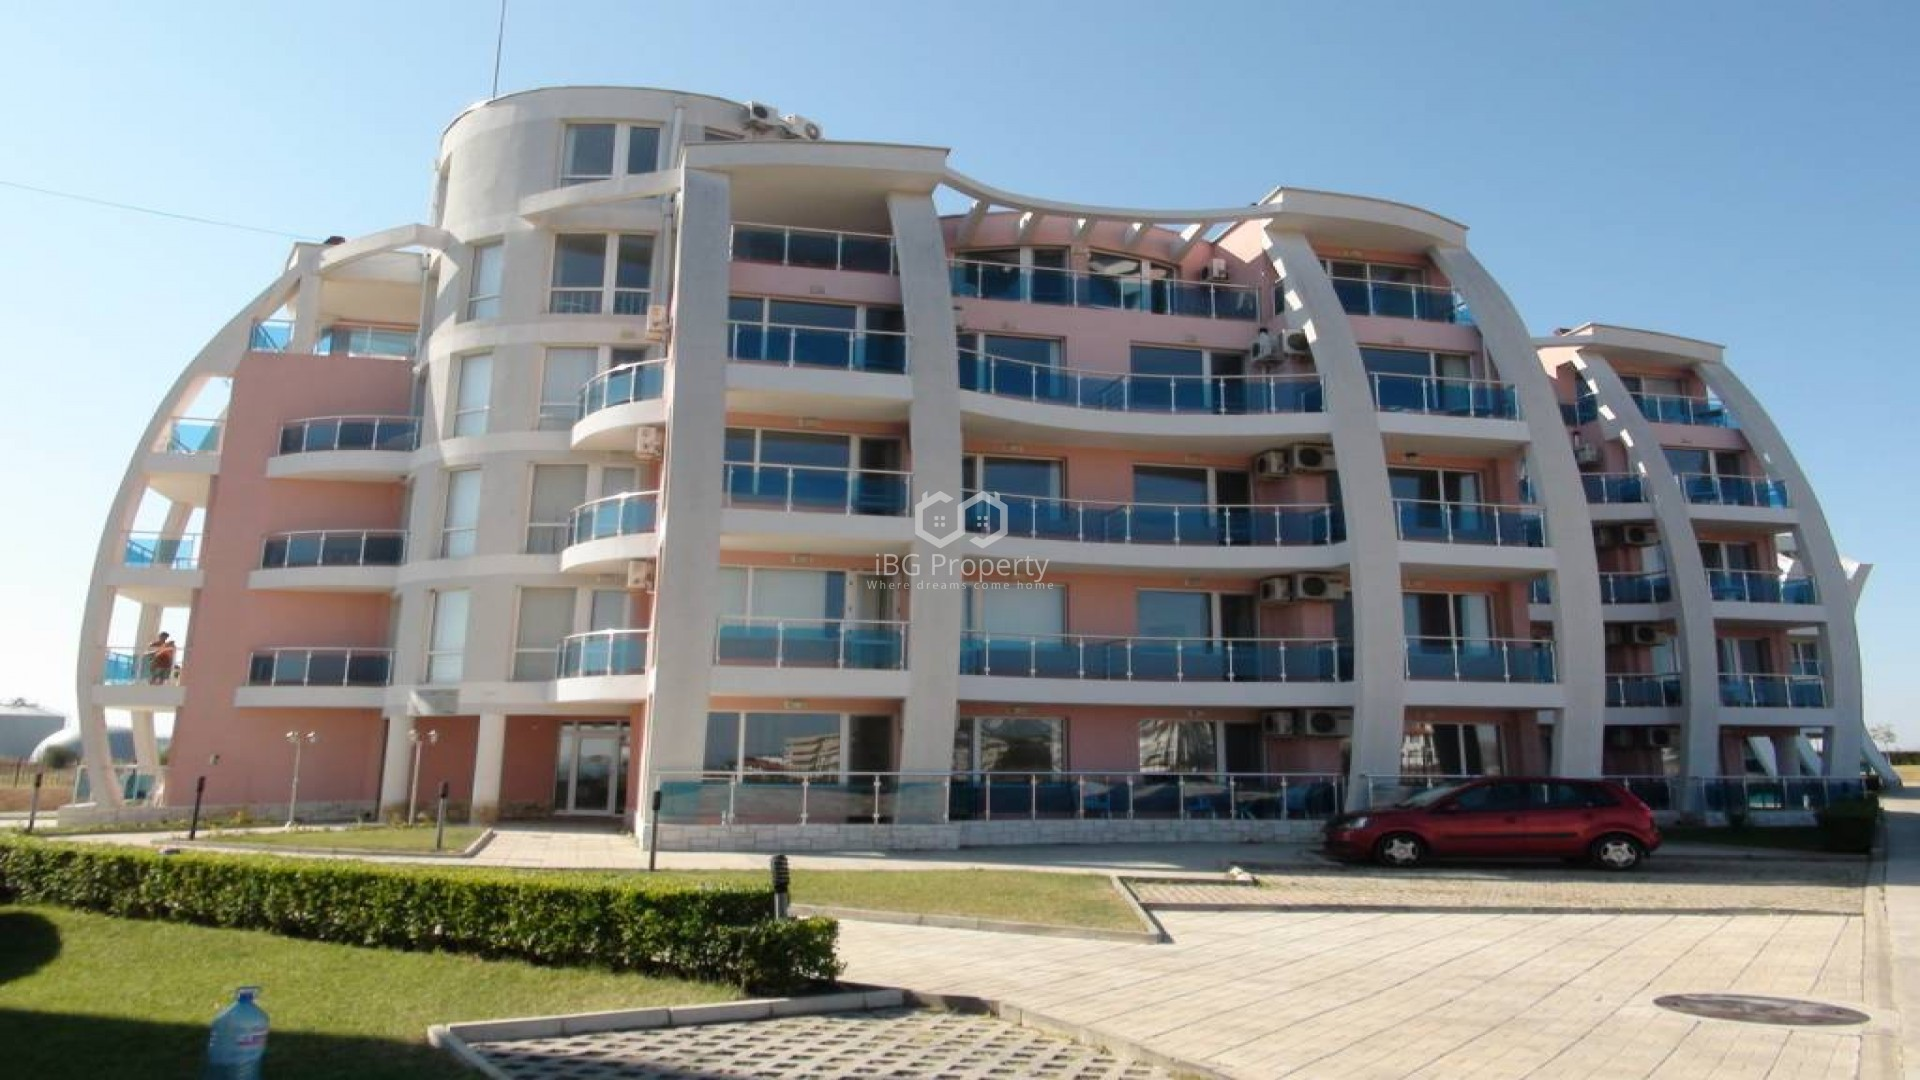 Двухкомнатная квартира Ахелой 71 m2